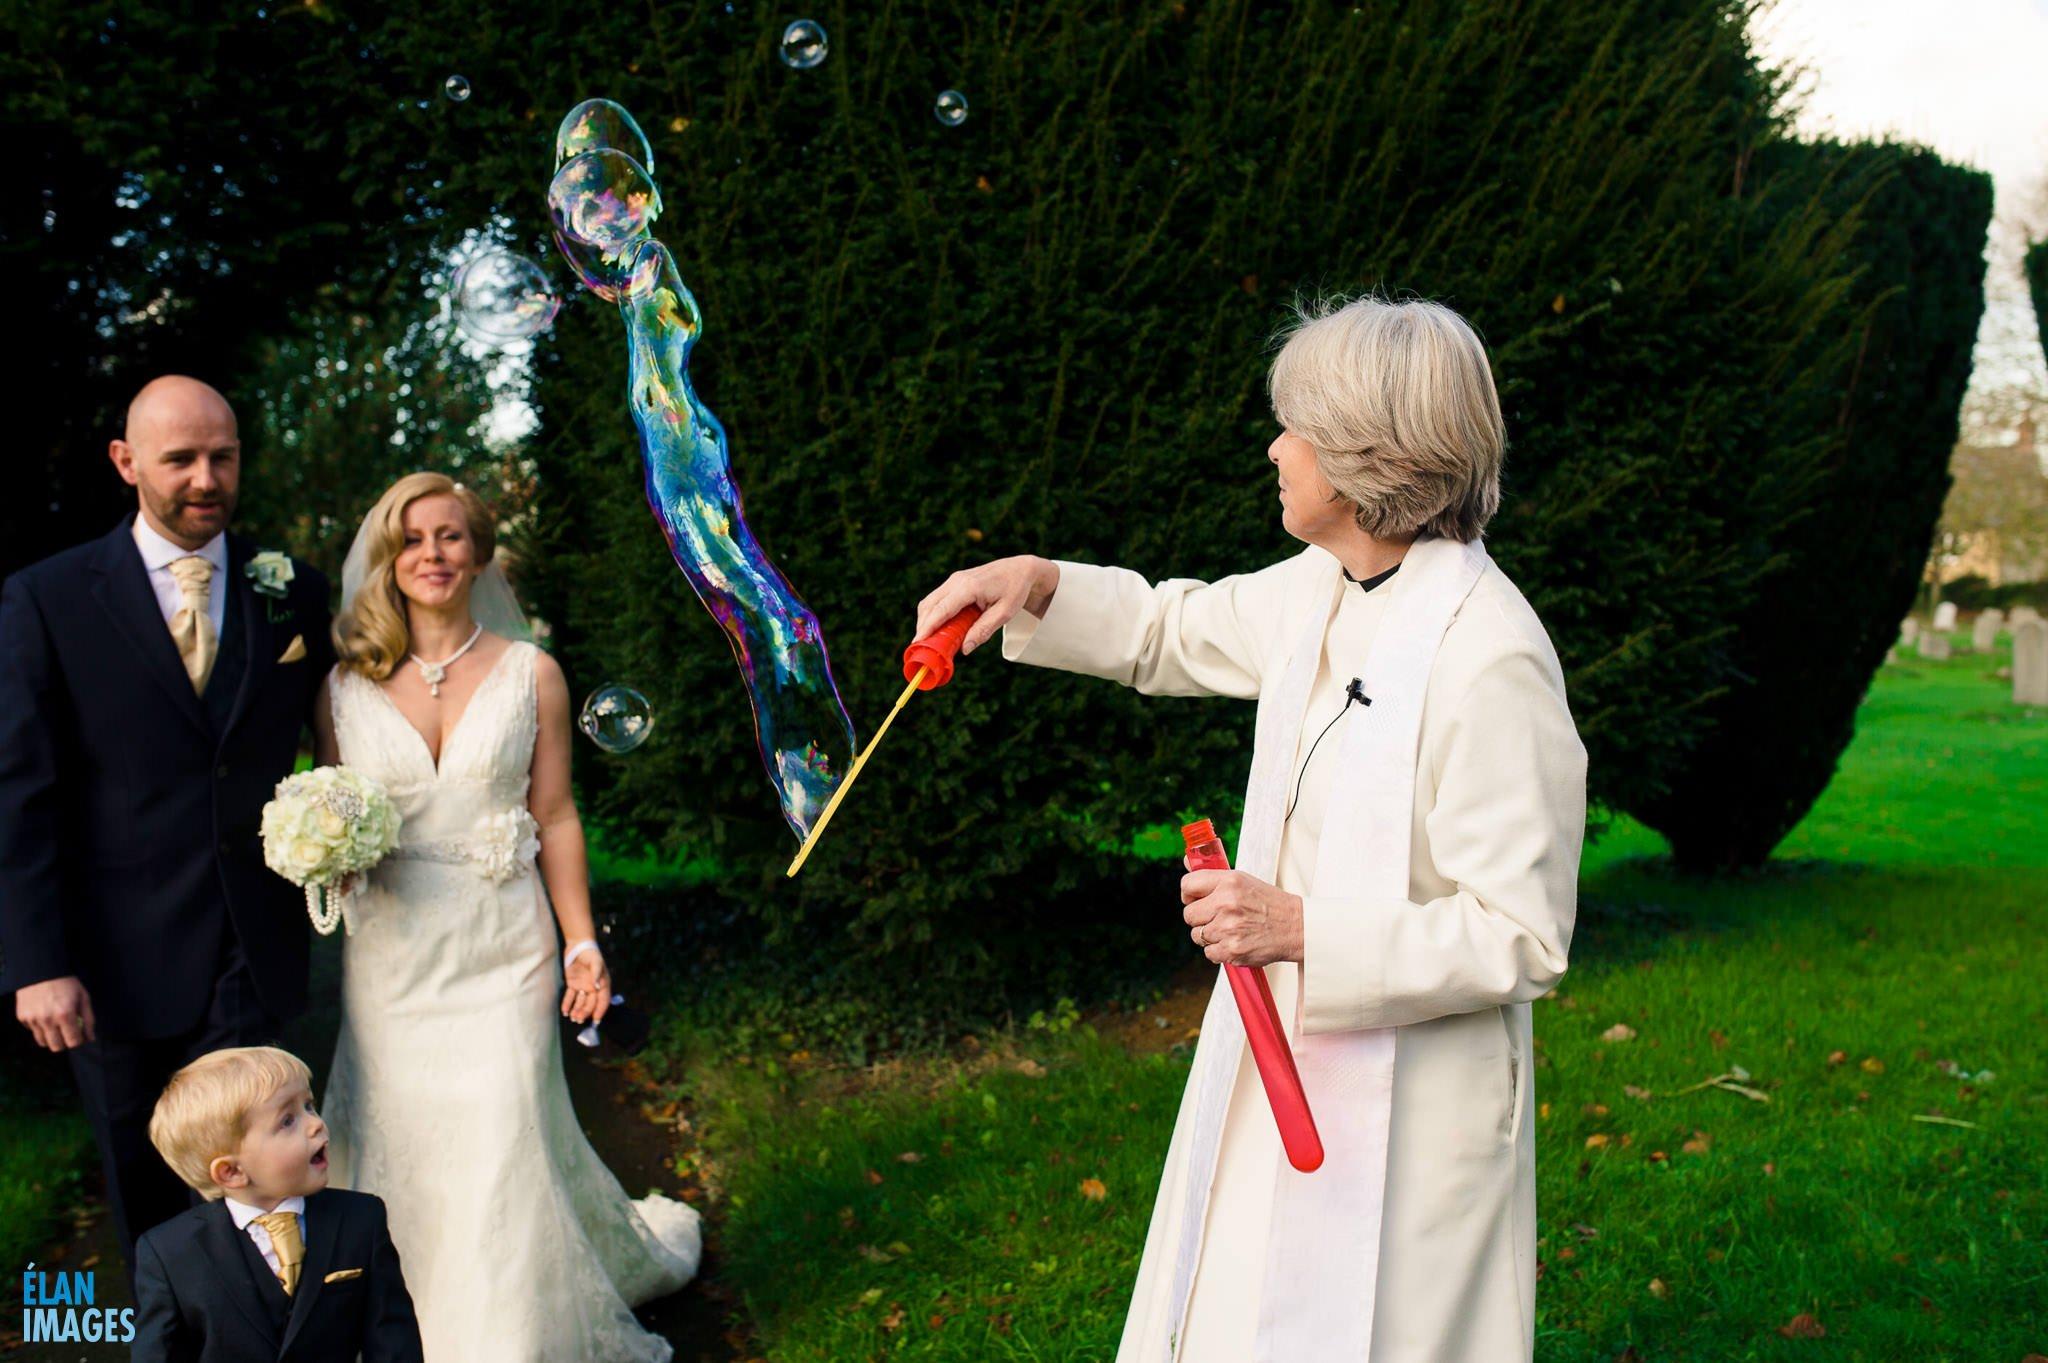 Wedding at leigh park hotel -066